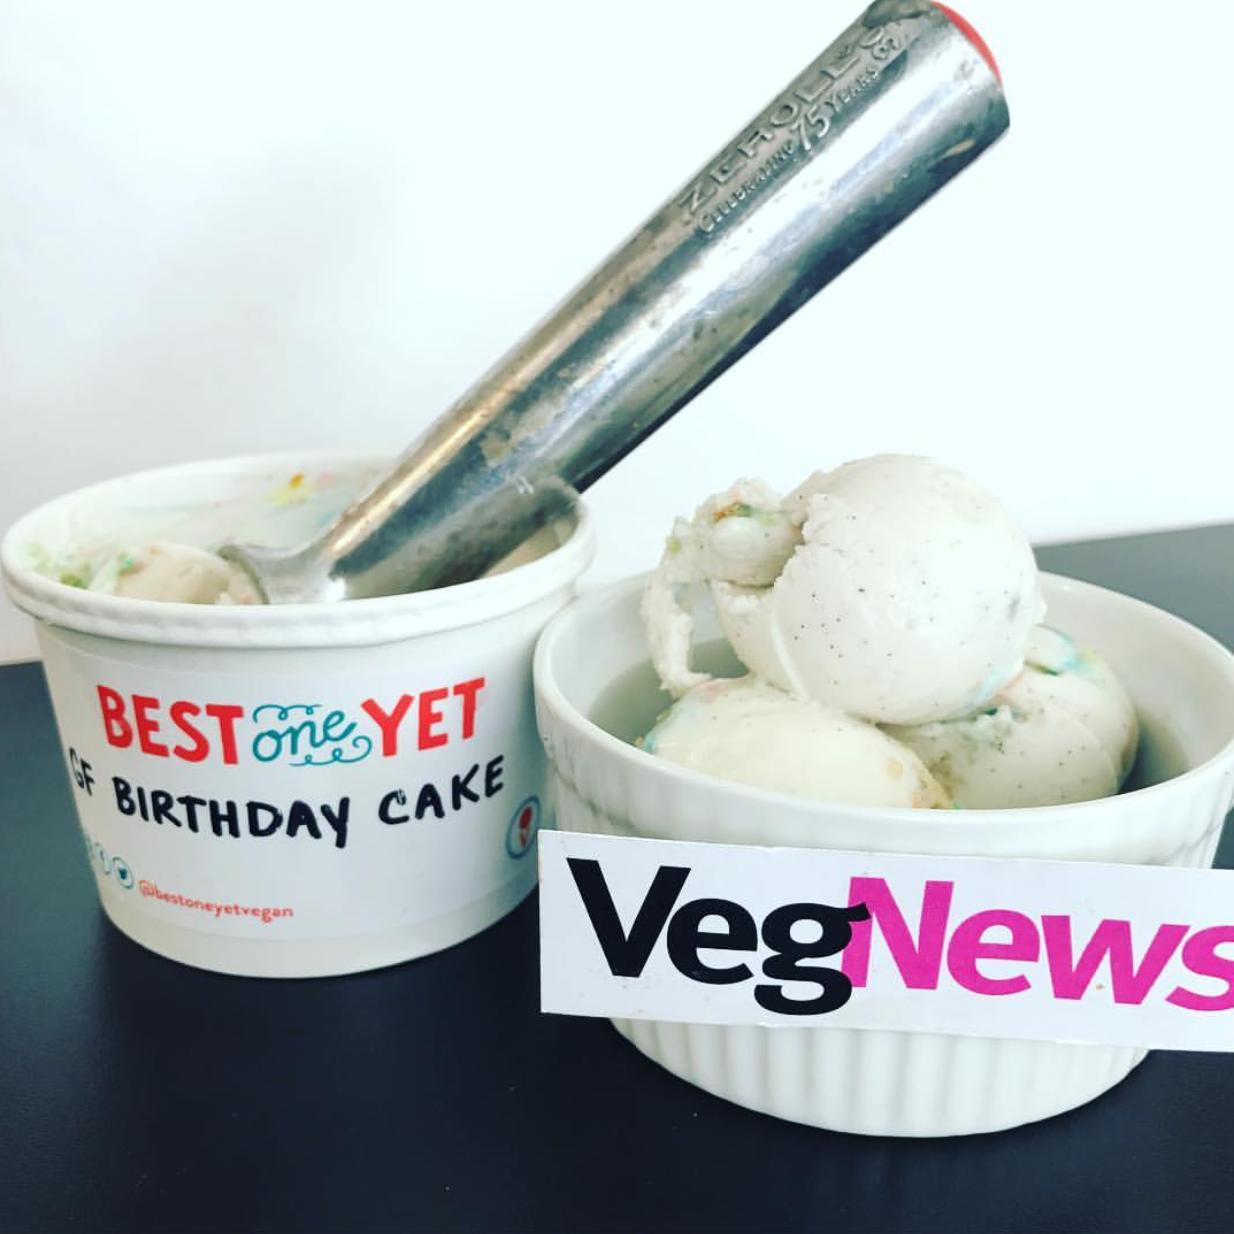 VegNews - It's My [Gluten-Free] Birthday Cake Ice Cream